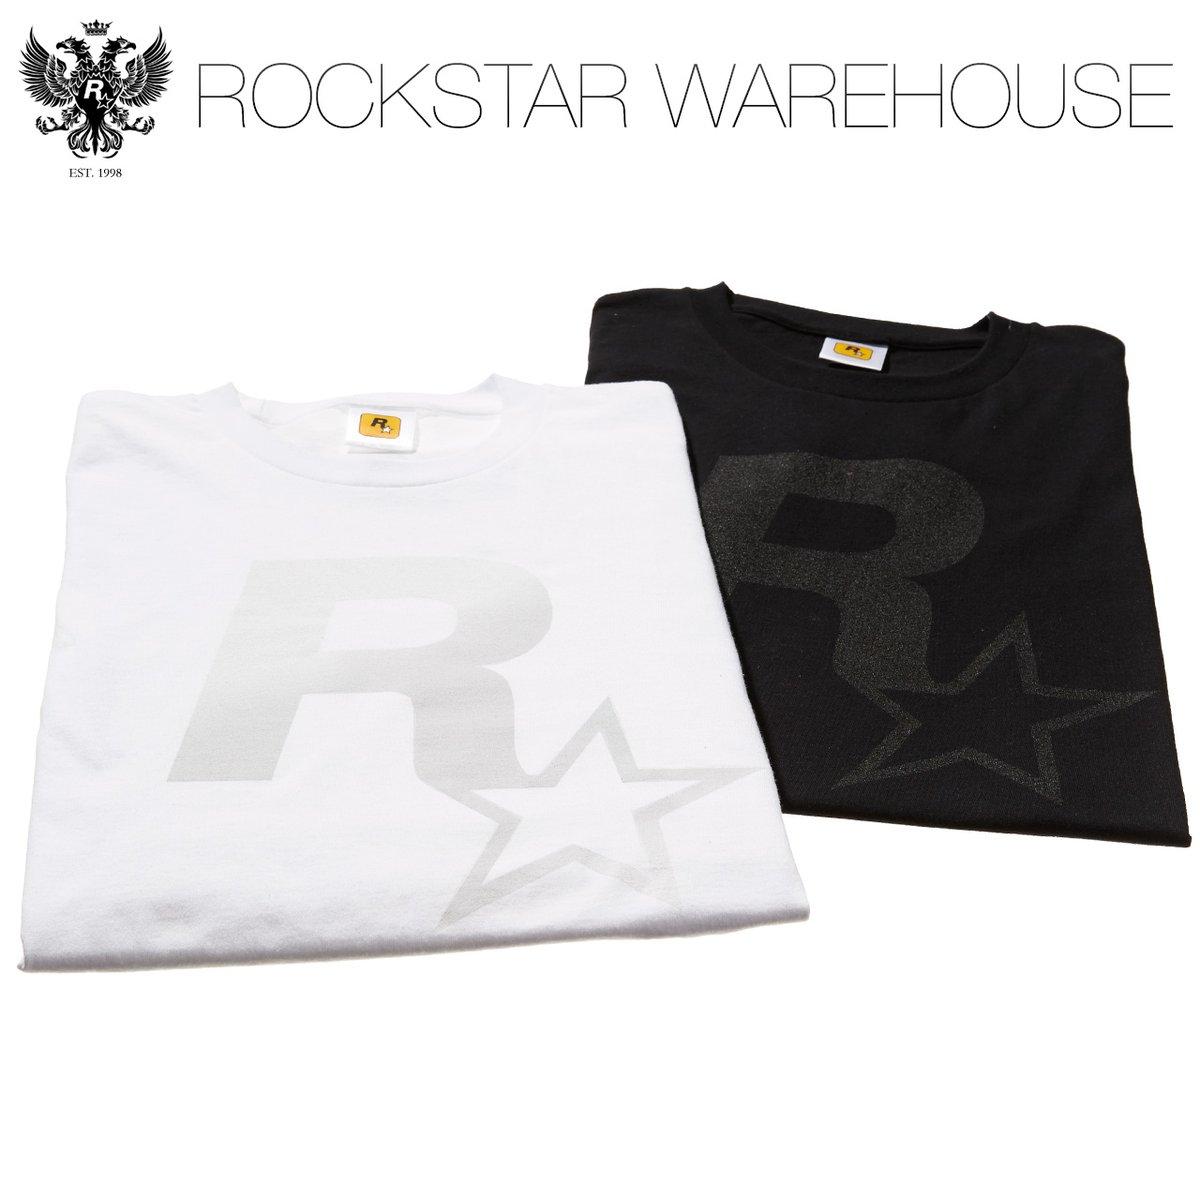 Rockstar Games - Rockstar Warehouse Nouveaux T-Shirts